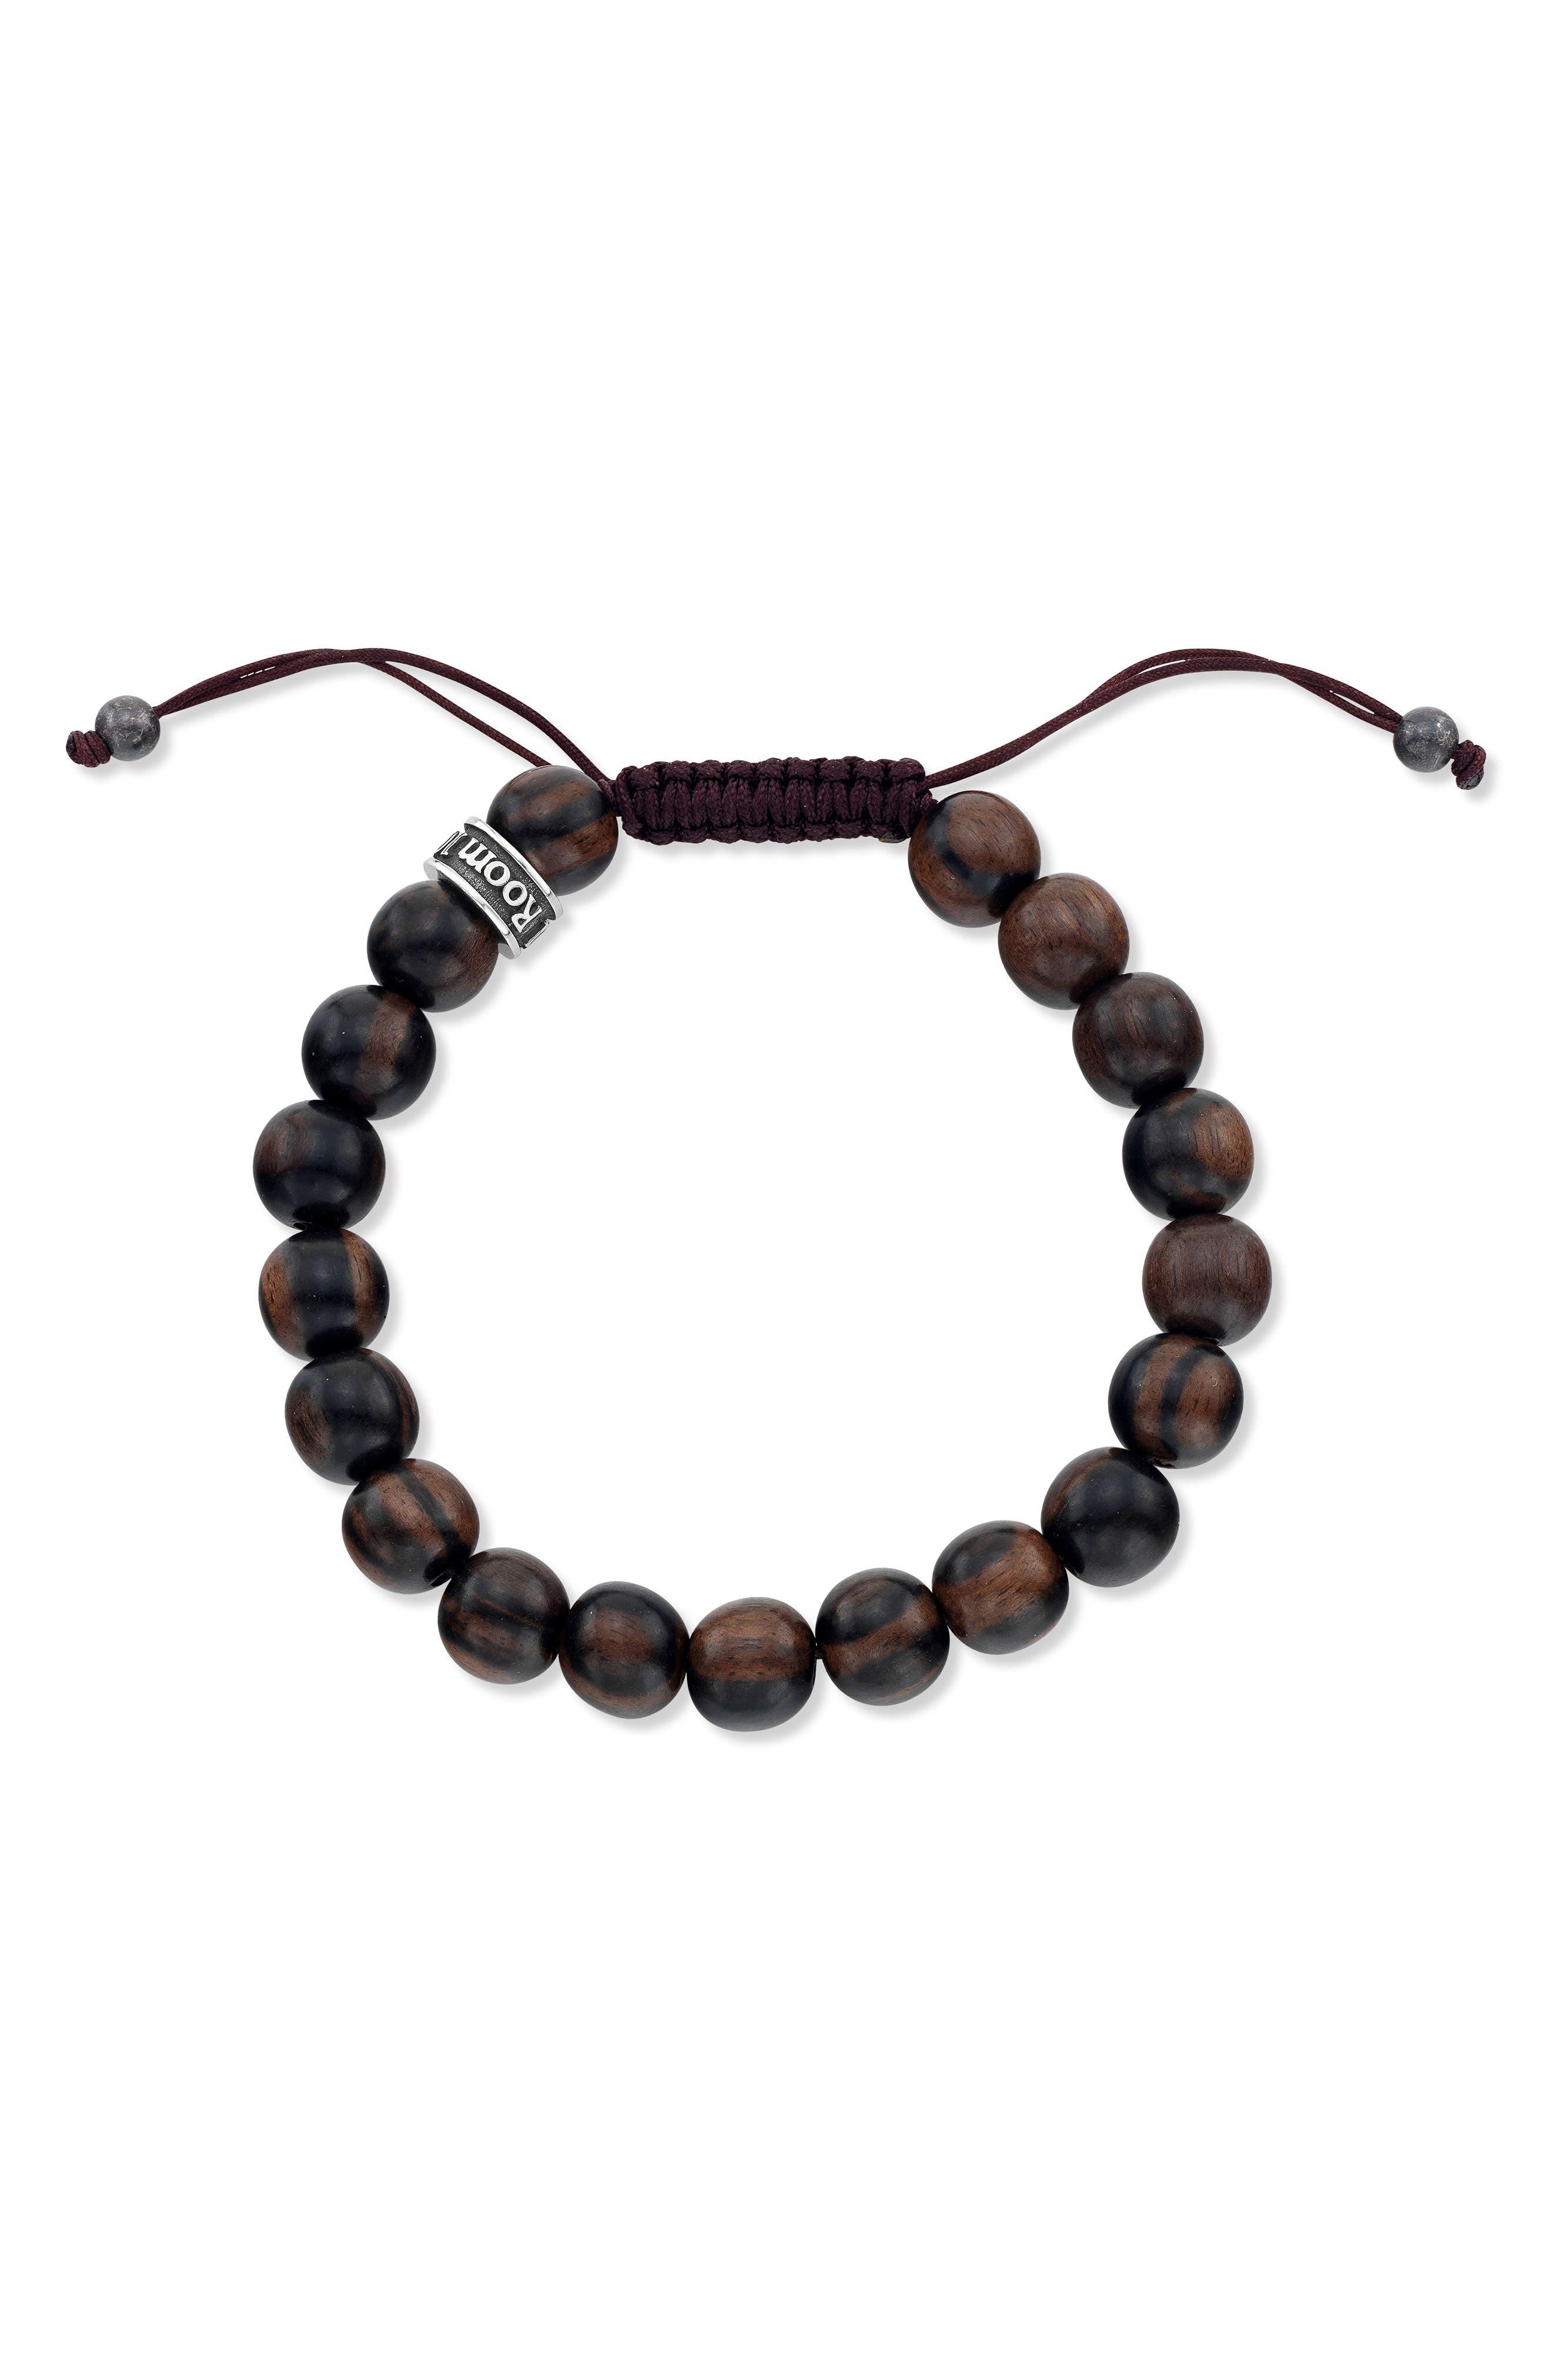 Main Image - Room101 Wood Bead Shamballa Bracelet